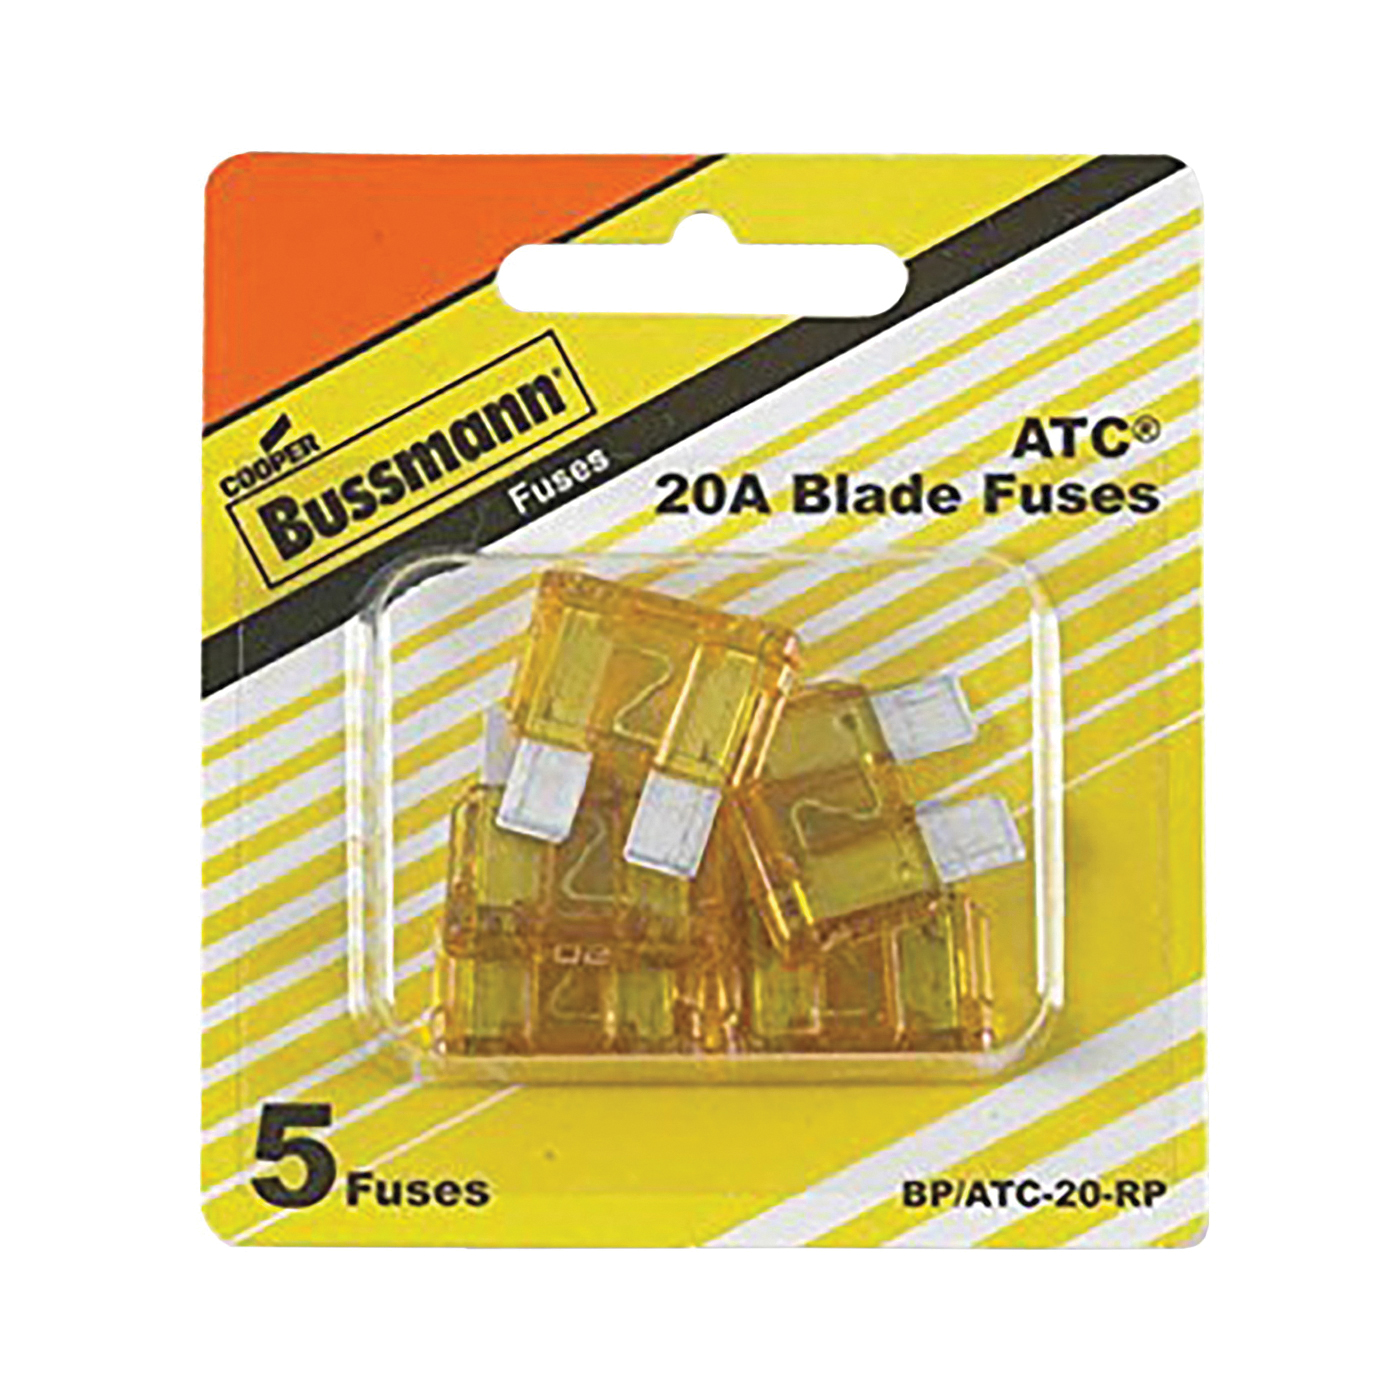 Picture of Bussmann BP/ATC-20-RP Blade Fuse, 32 VDC, 20 A, 1 kA Interrupt